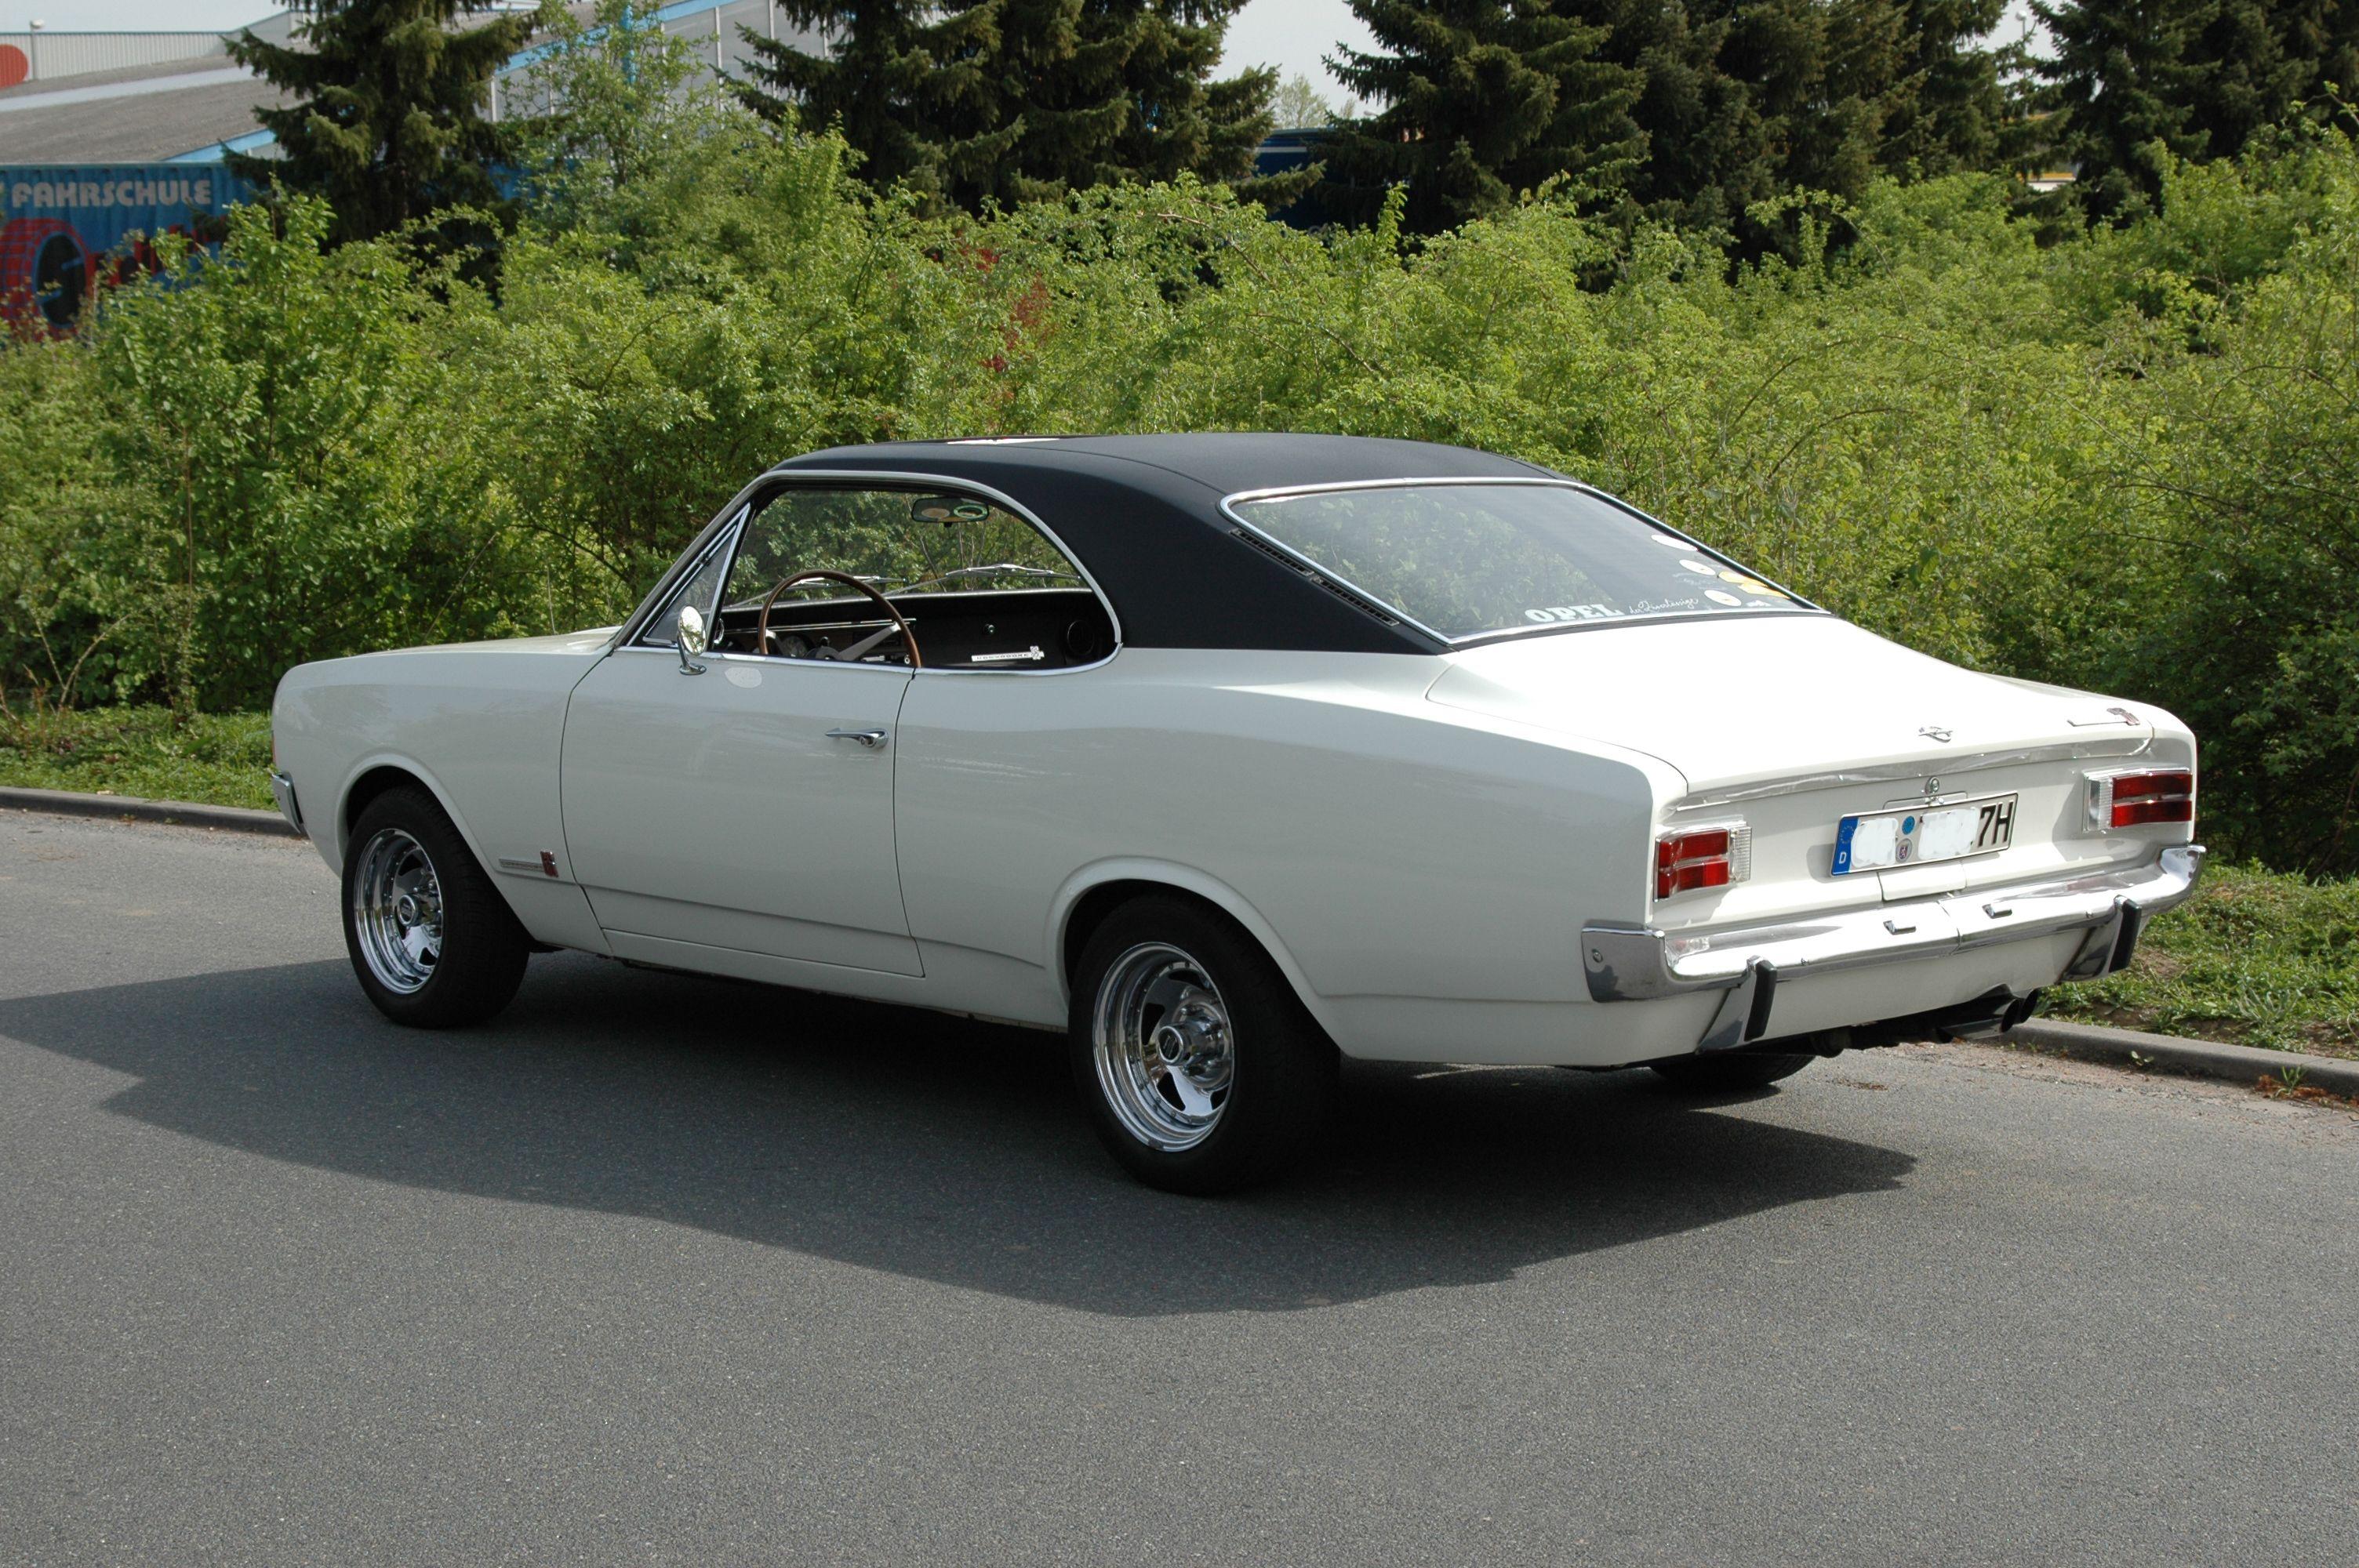 Pin Von Vasilis Kanel Auf Opel 1969 Oldtimer Alte Autos Autos